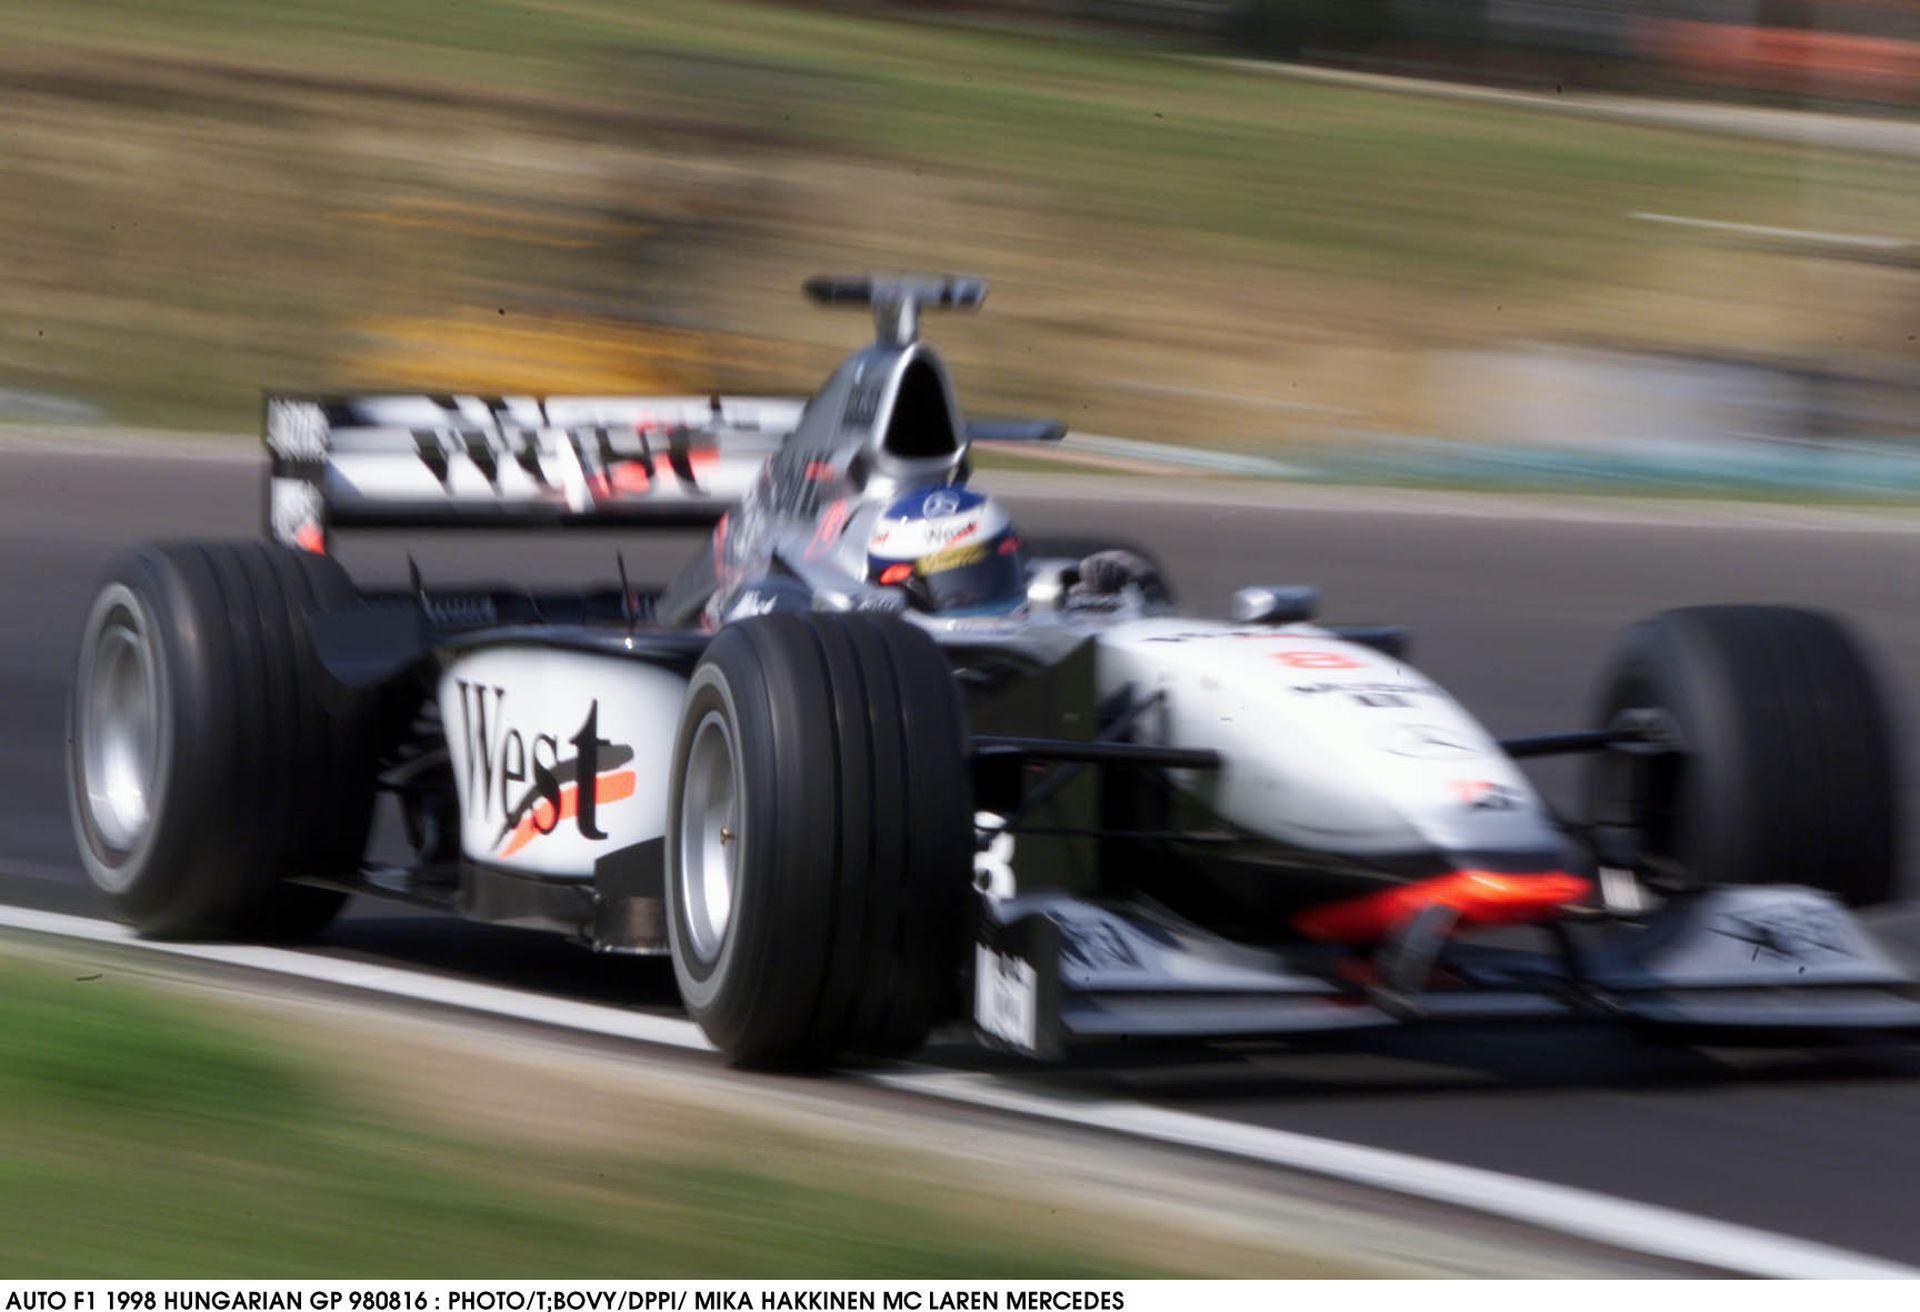 Mika Hakkinen tolja neki a McLarennel a Hungaroringen: 1998